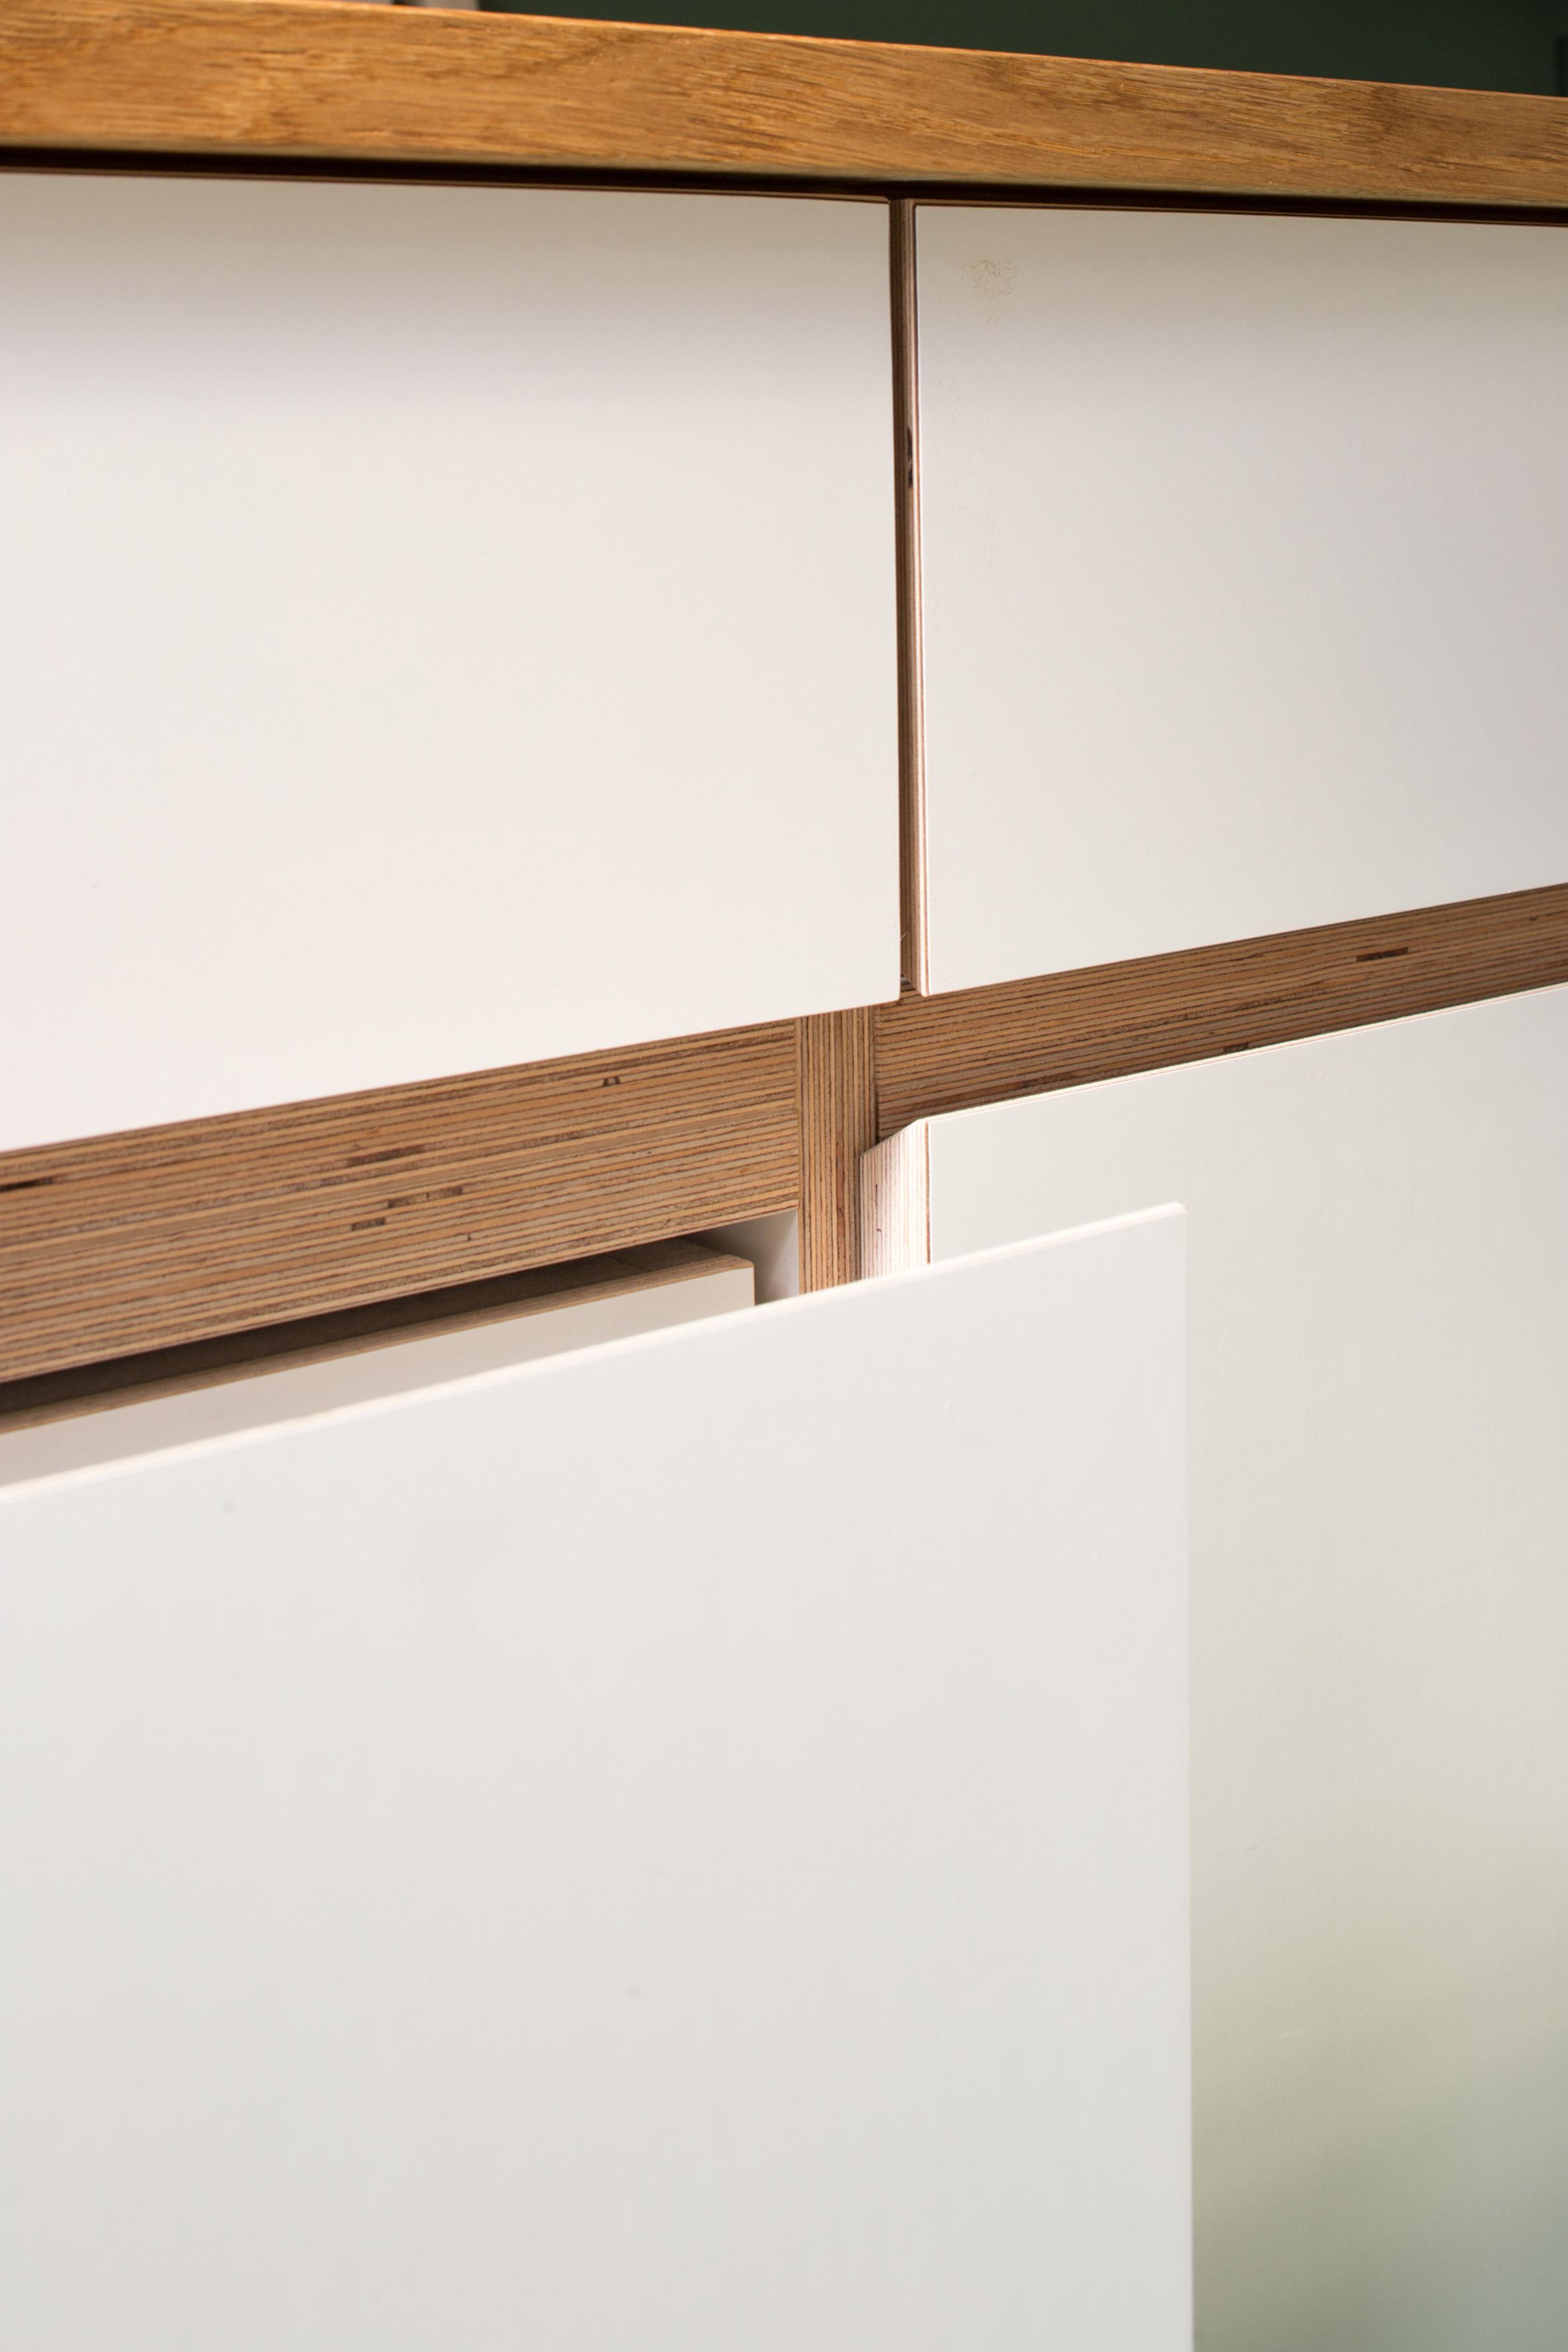 architecture-paris-apartment-design-studia-interiors-osnovadesign-osnova-poltava_13